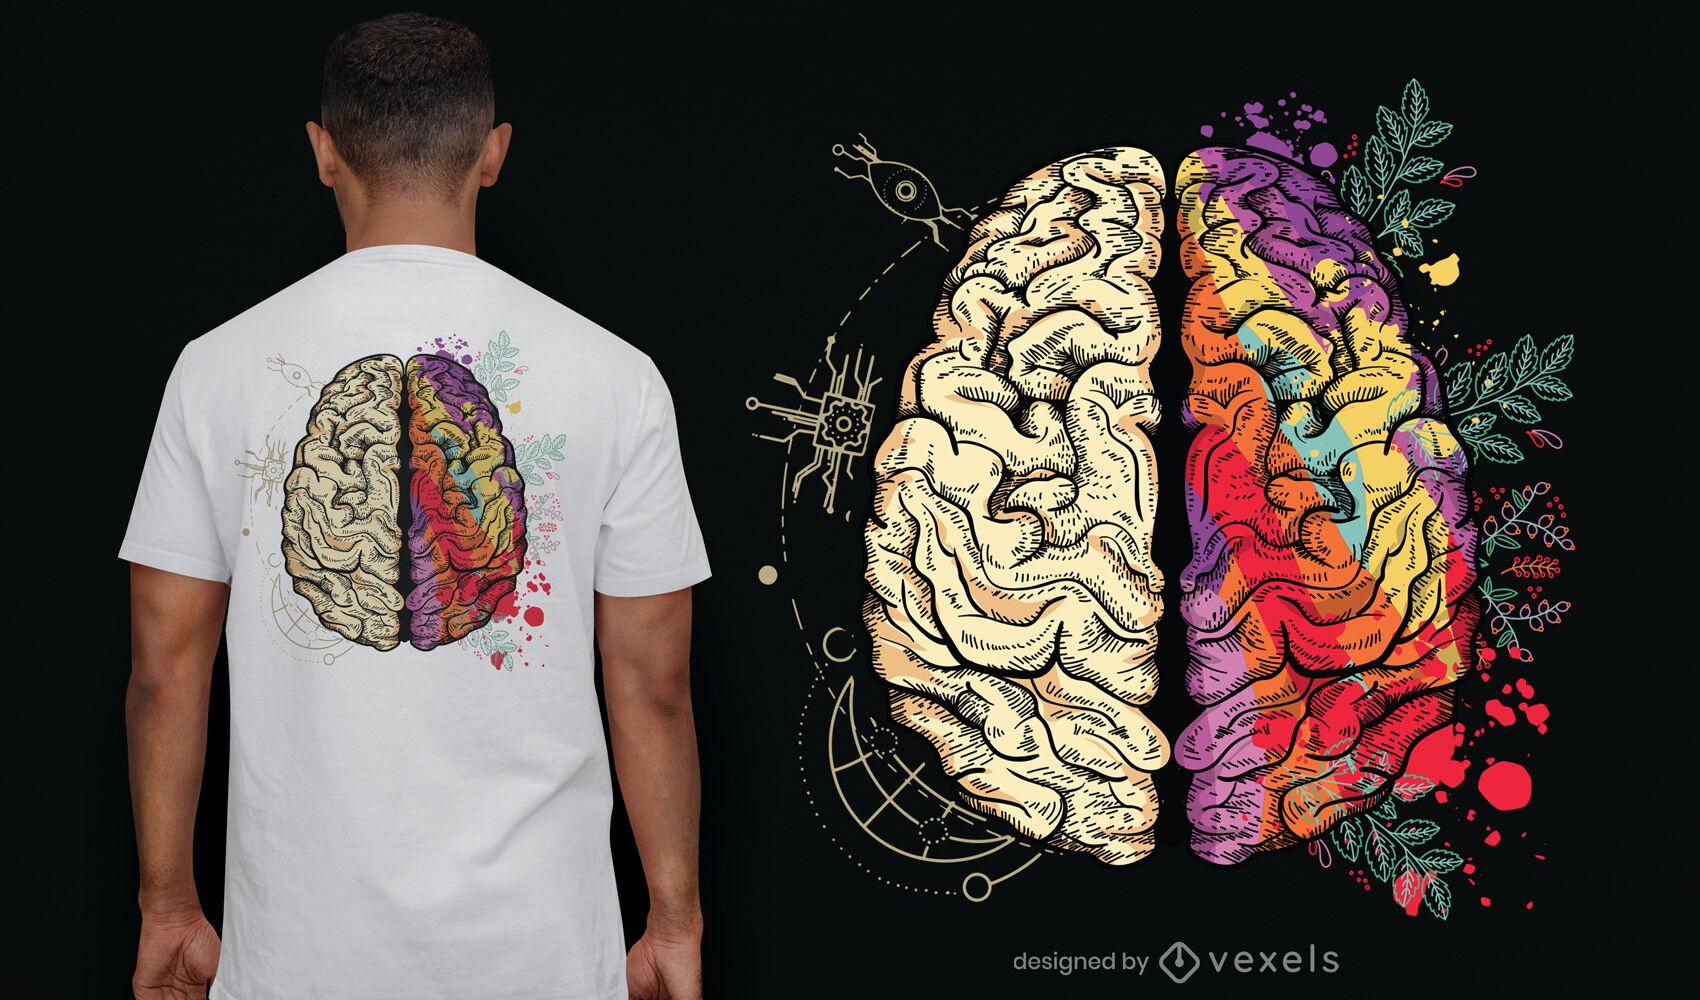 Gehirn-Hemisferes-Illustrations-T-Shirt-Design